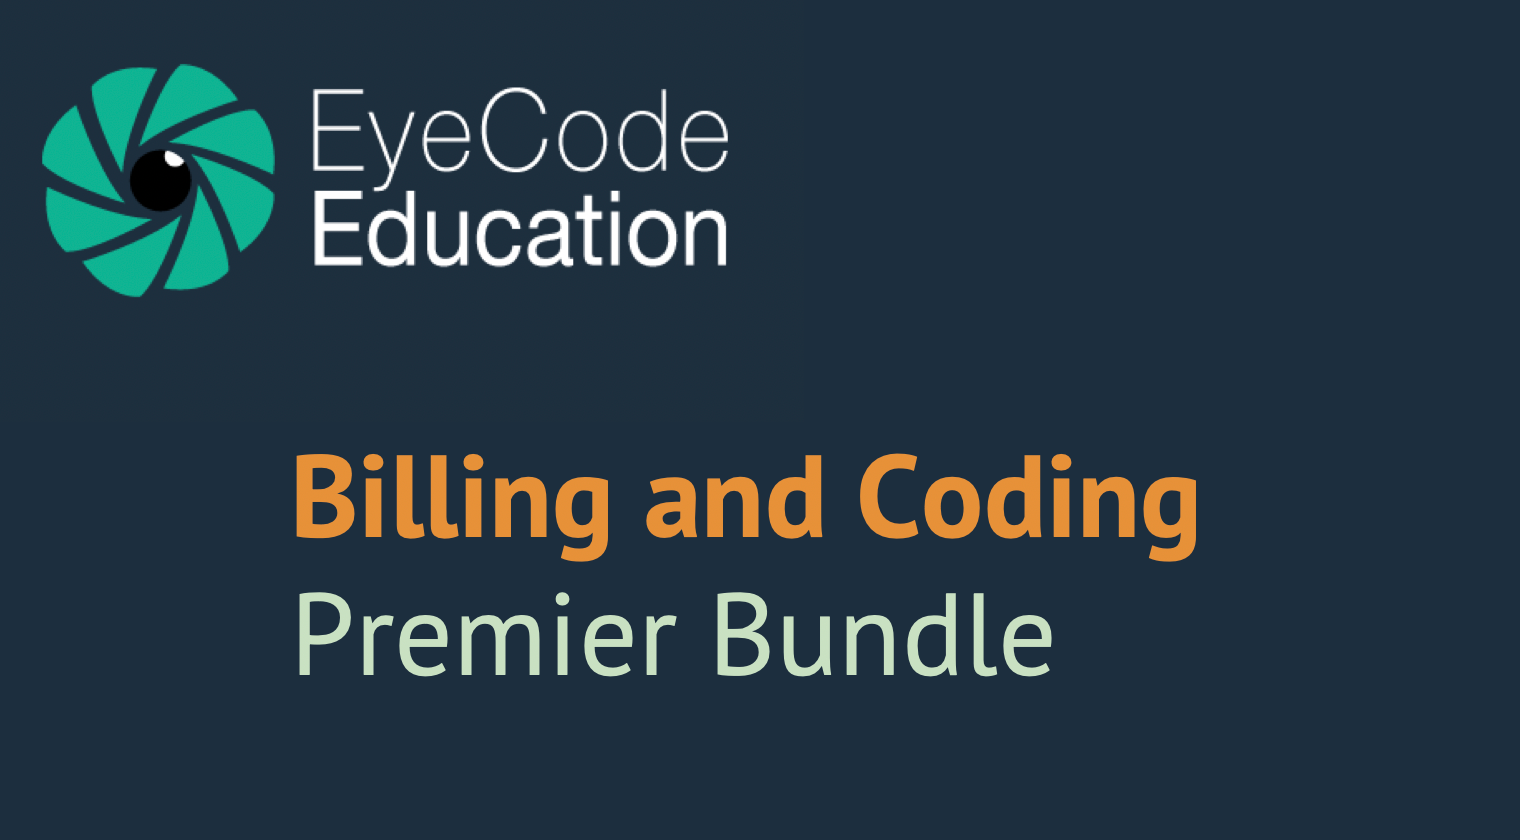 EyeCode Billing and Coding Premiere Bundle